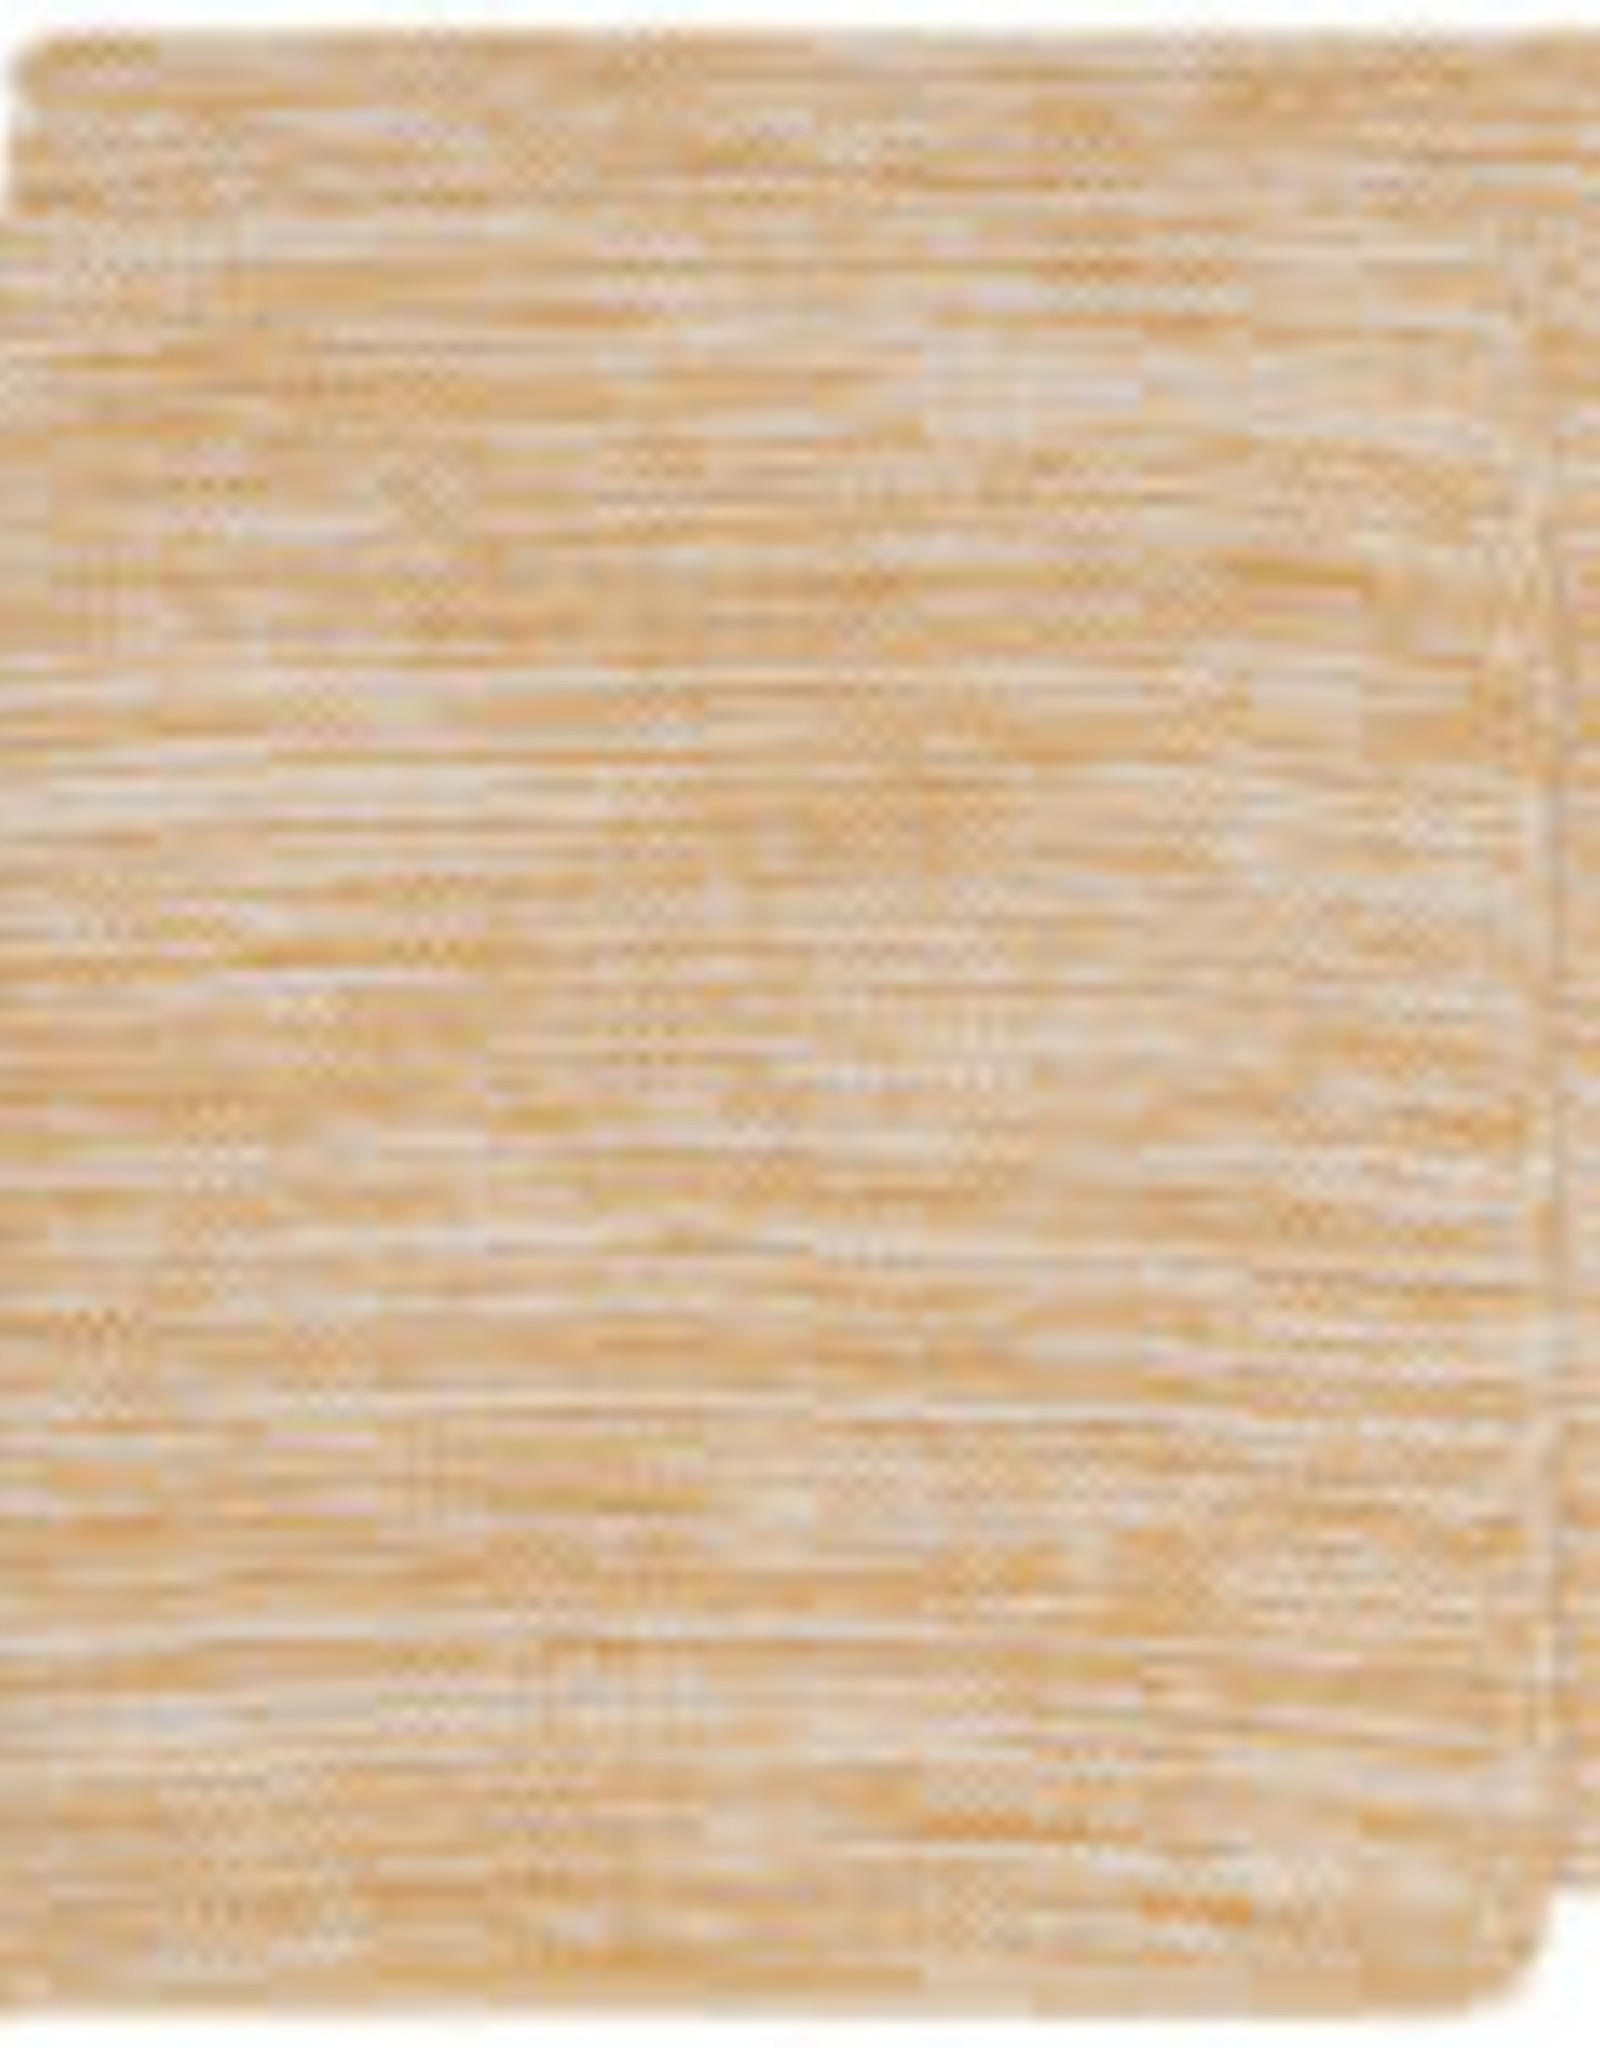 DISHCLOTH KNIT 8X8 HEIRLOOM OCHRE YELLOW